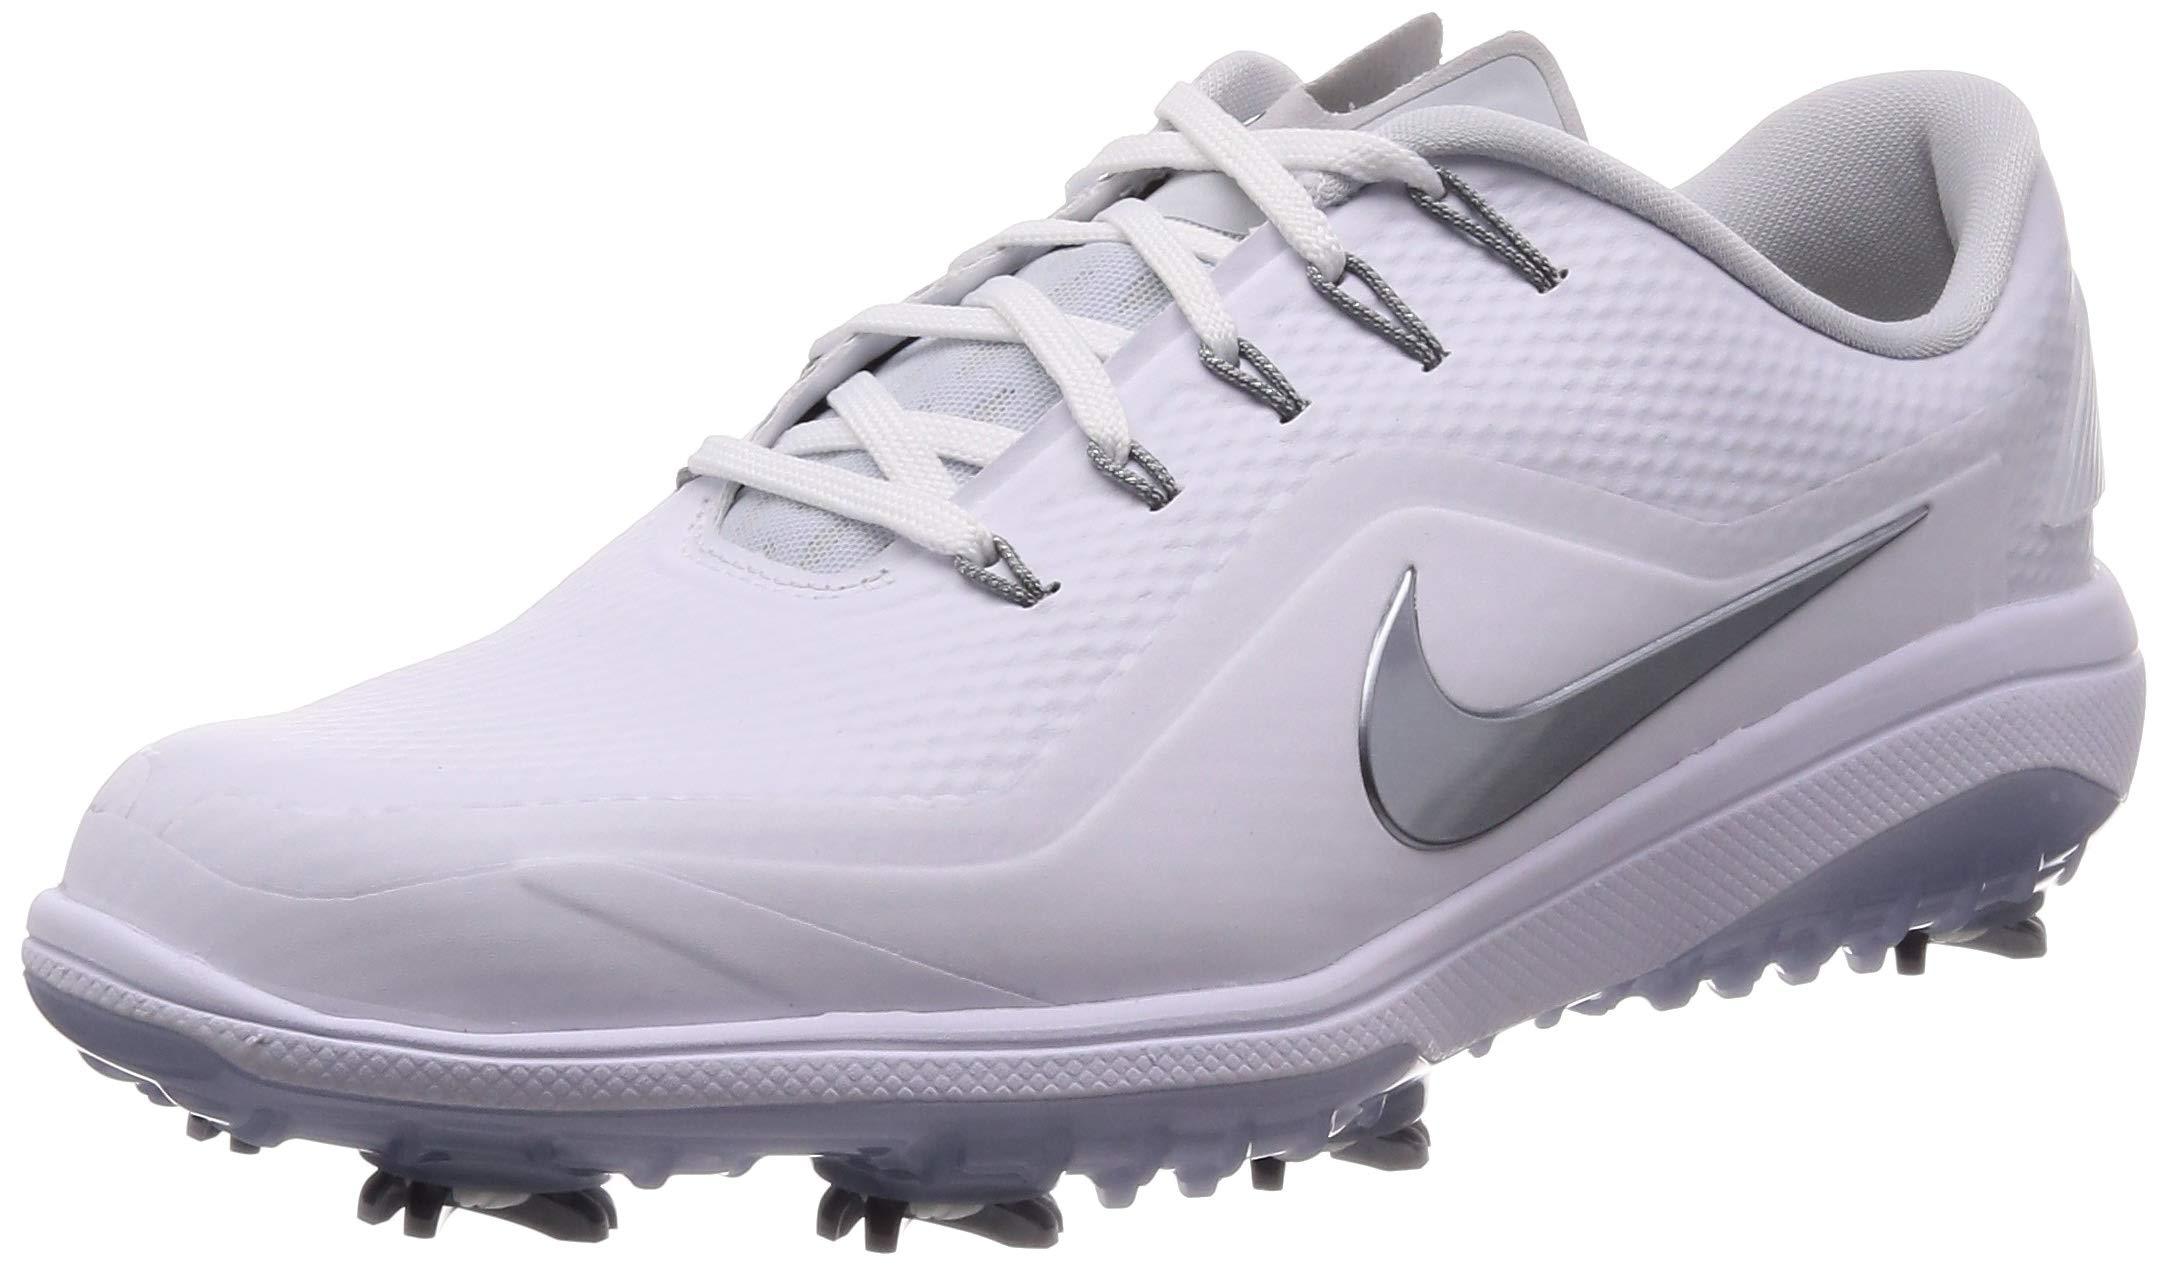 Nike React Vapor 2 Golf Shoes 2019 White/Metallic Cool Gray/White/Black Medium 9.5 by Nike